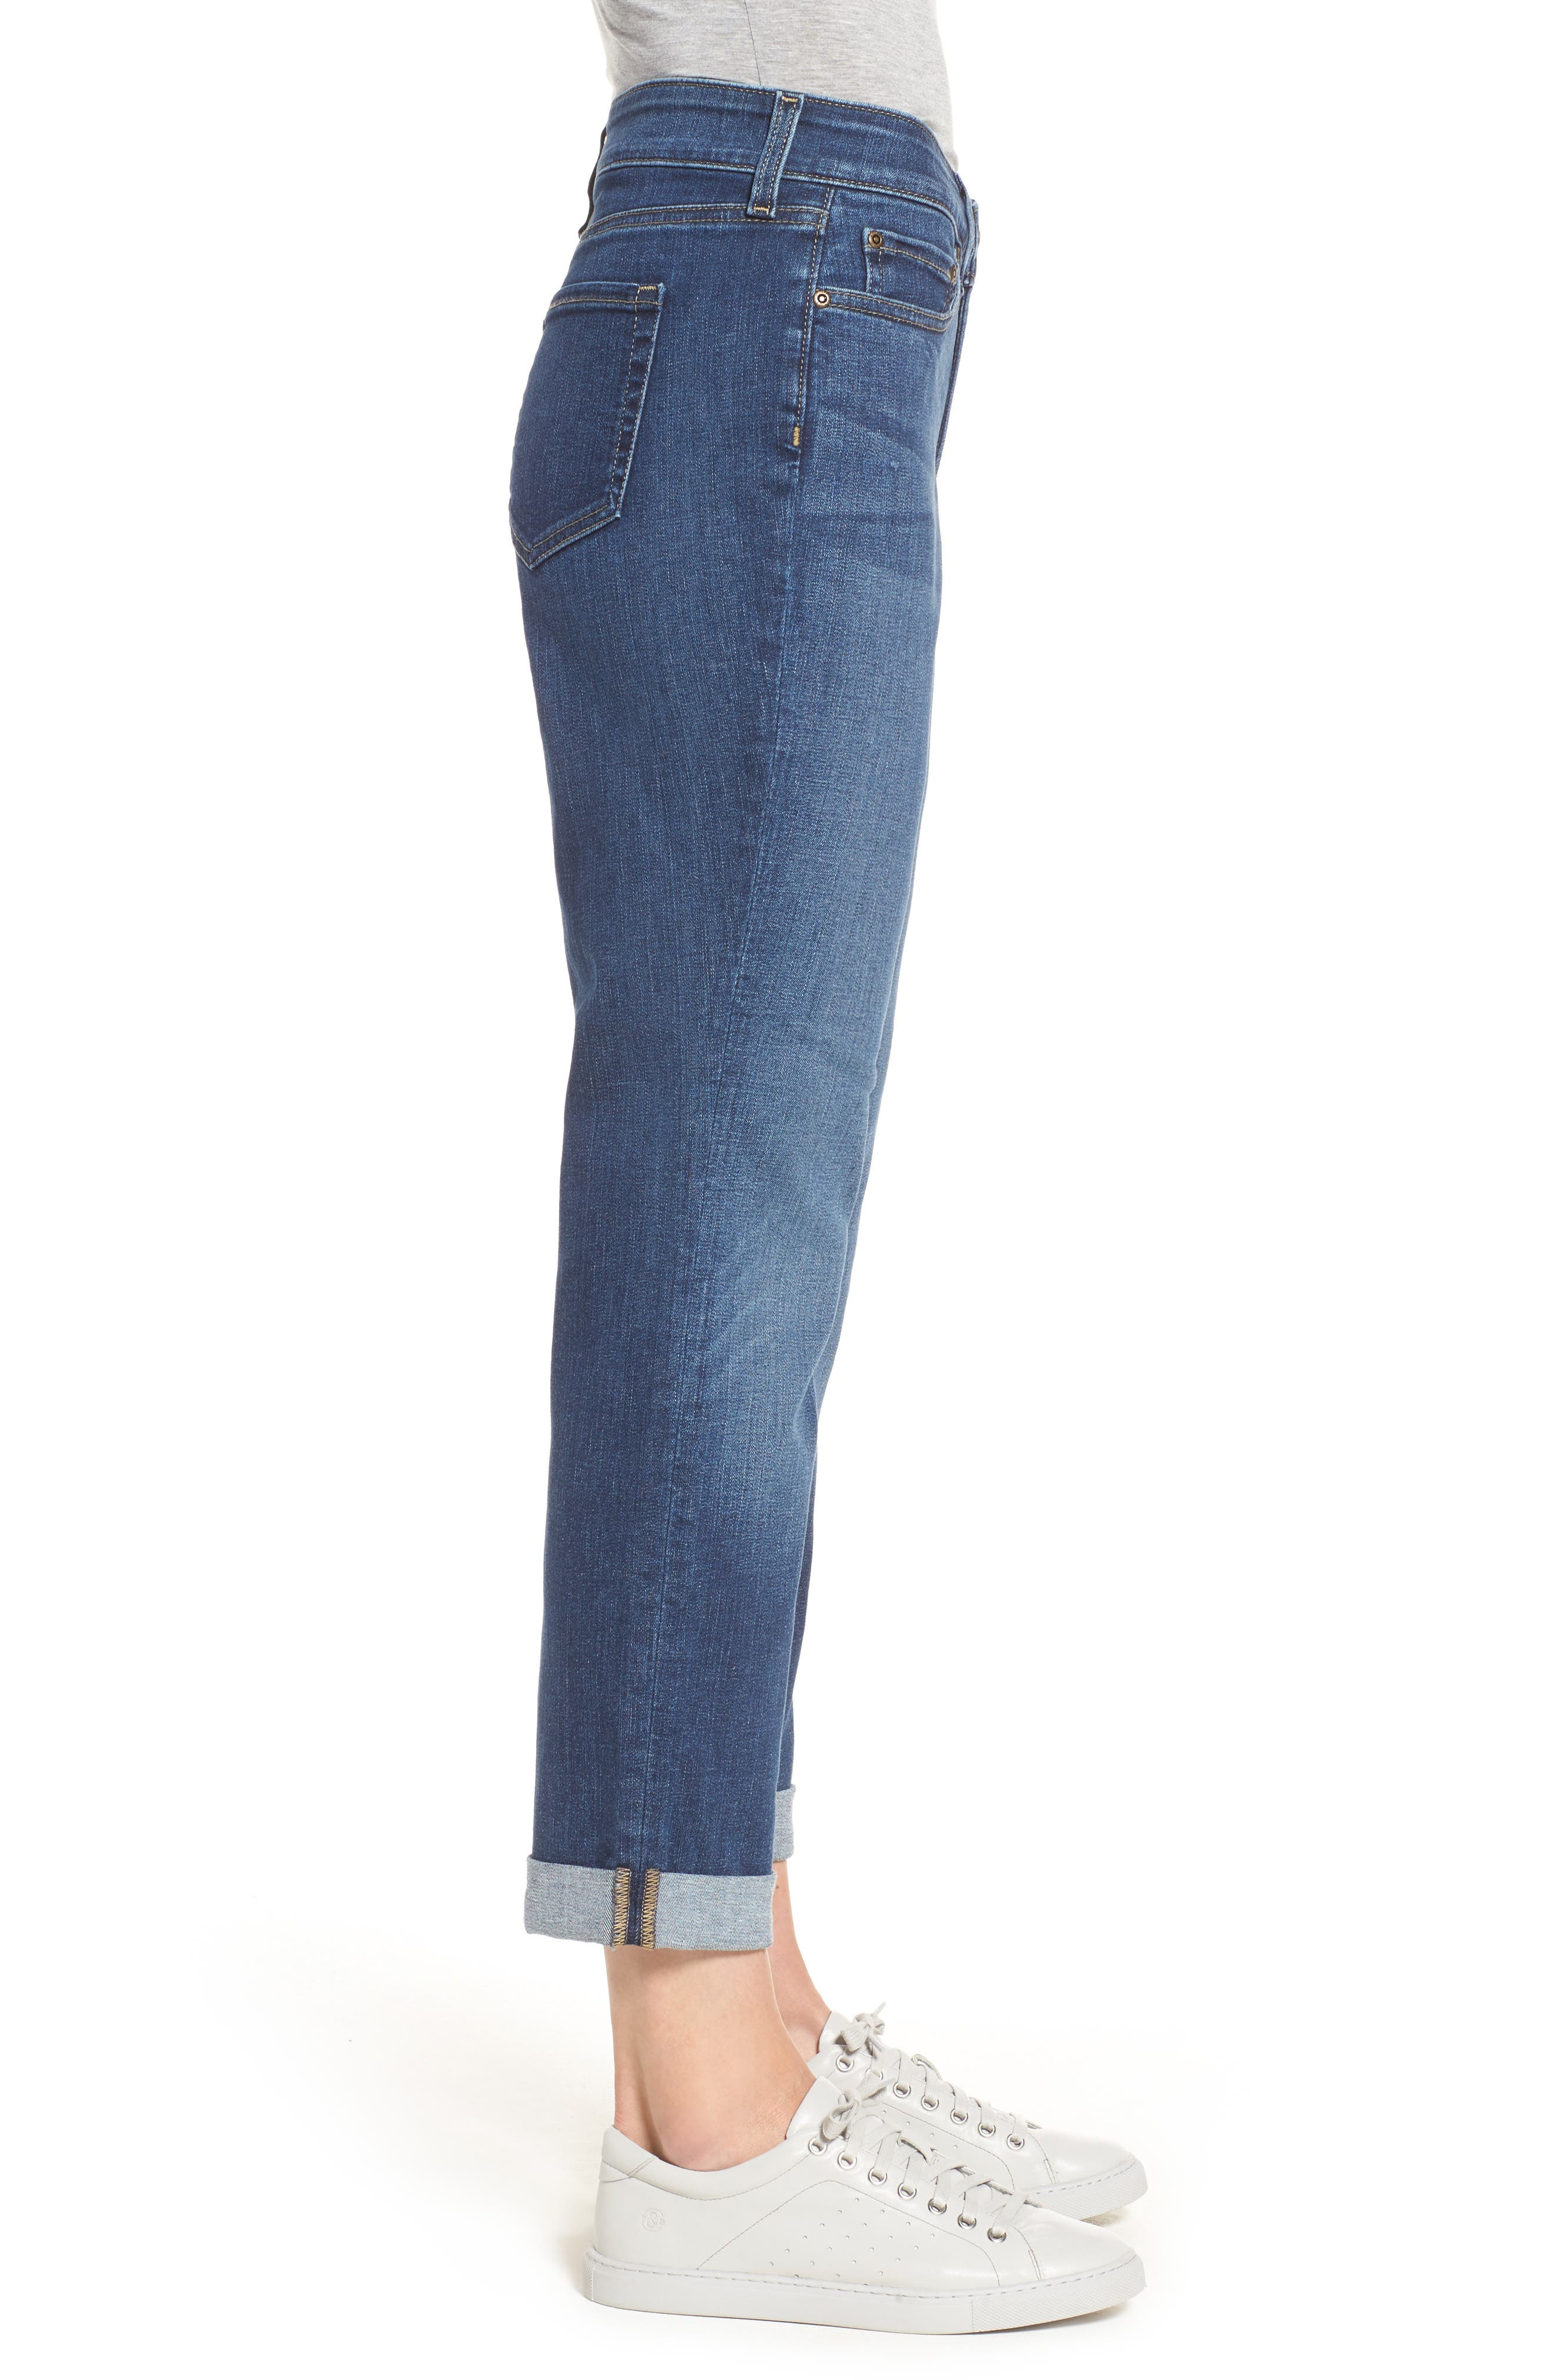 Alternate Image 3  - NYDJ Stretch Boyfriend Jeans (Regular & Petite)